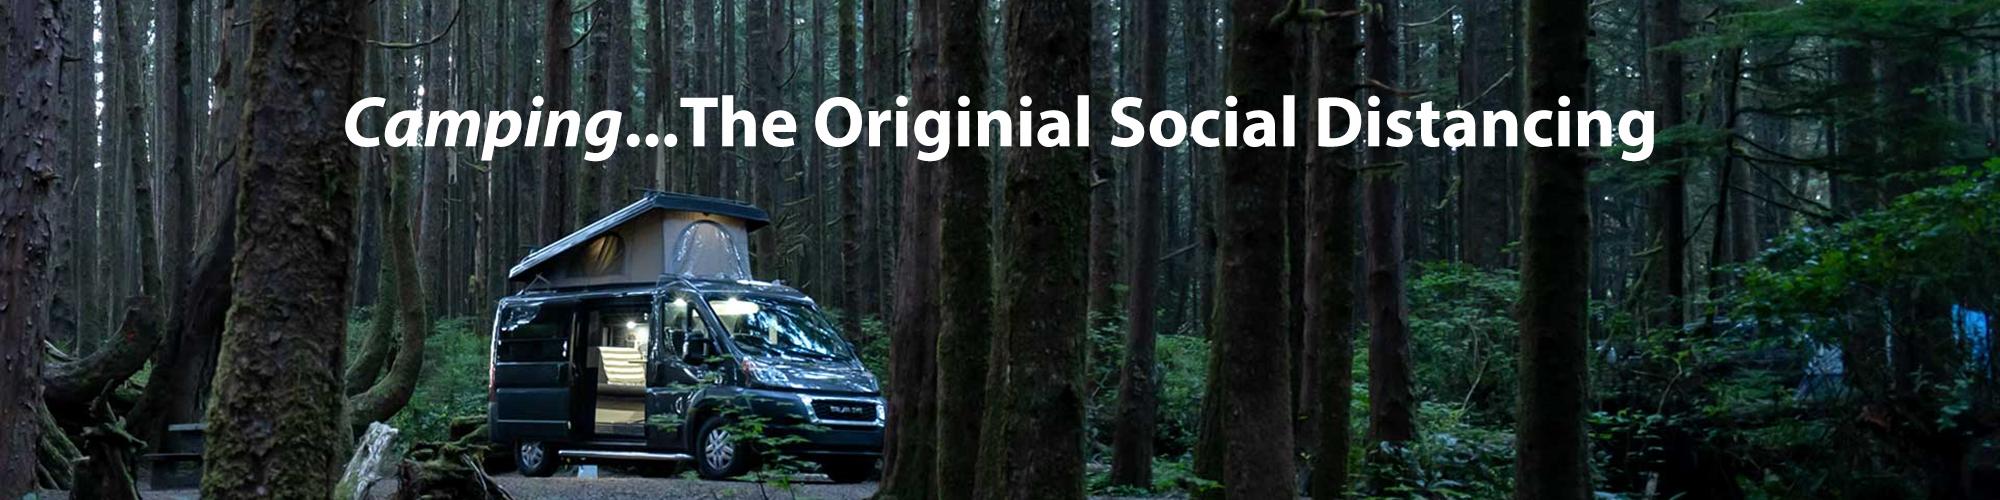 Camping the Original Social Distancing